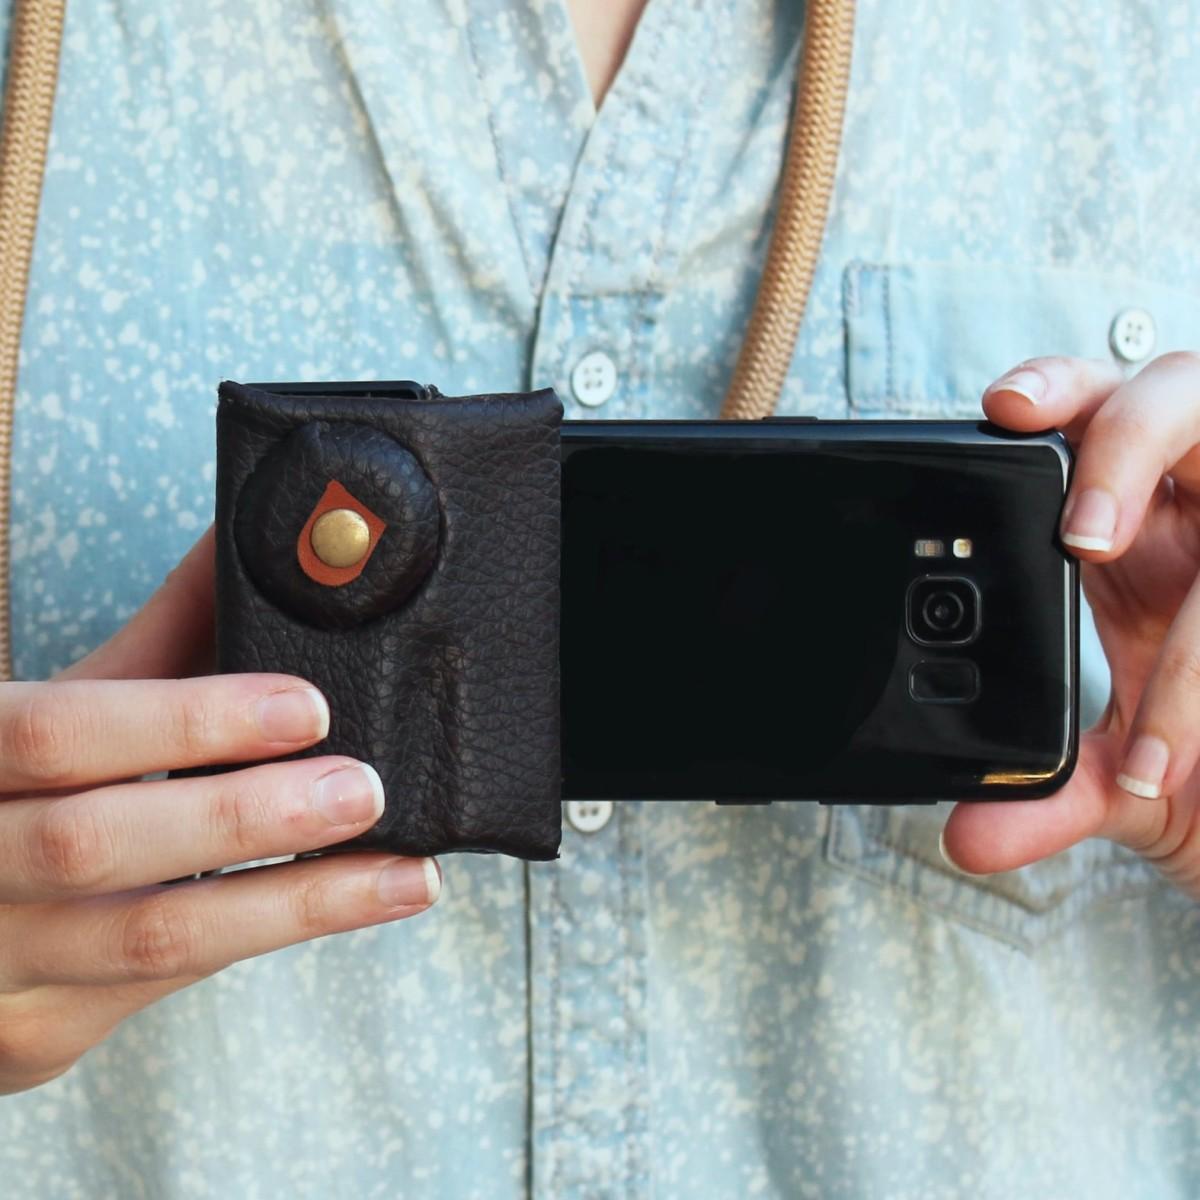 Lensta Grip Universal Smartphone Stabilizer helps you get better footage